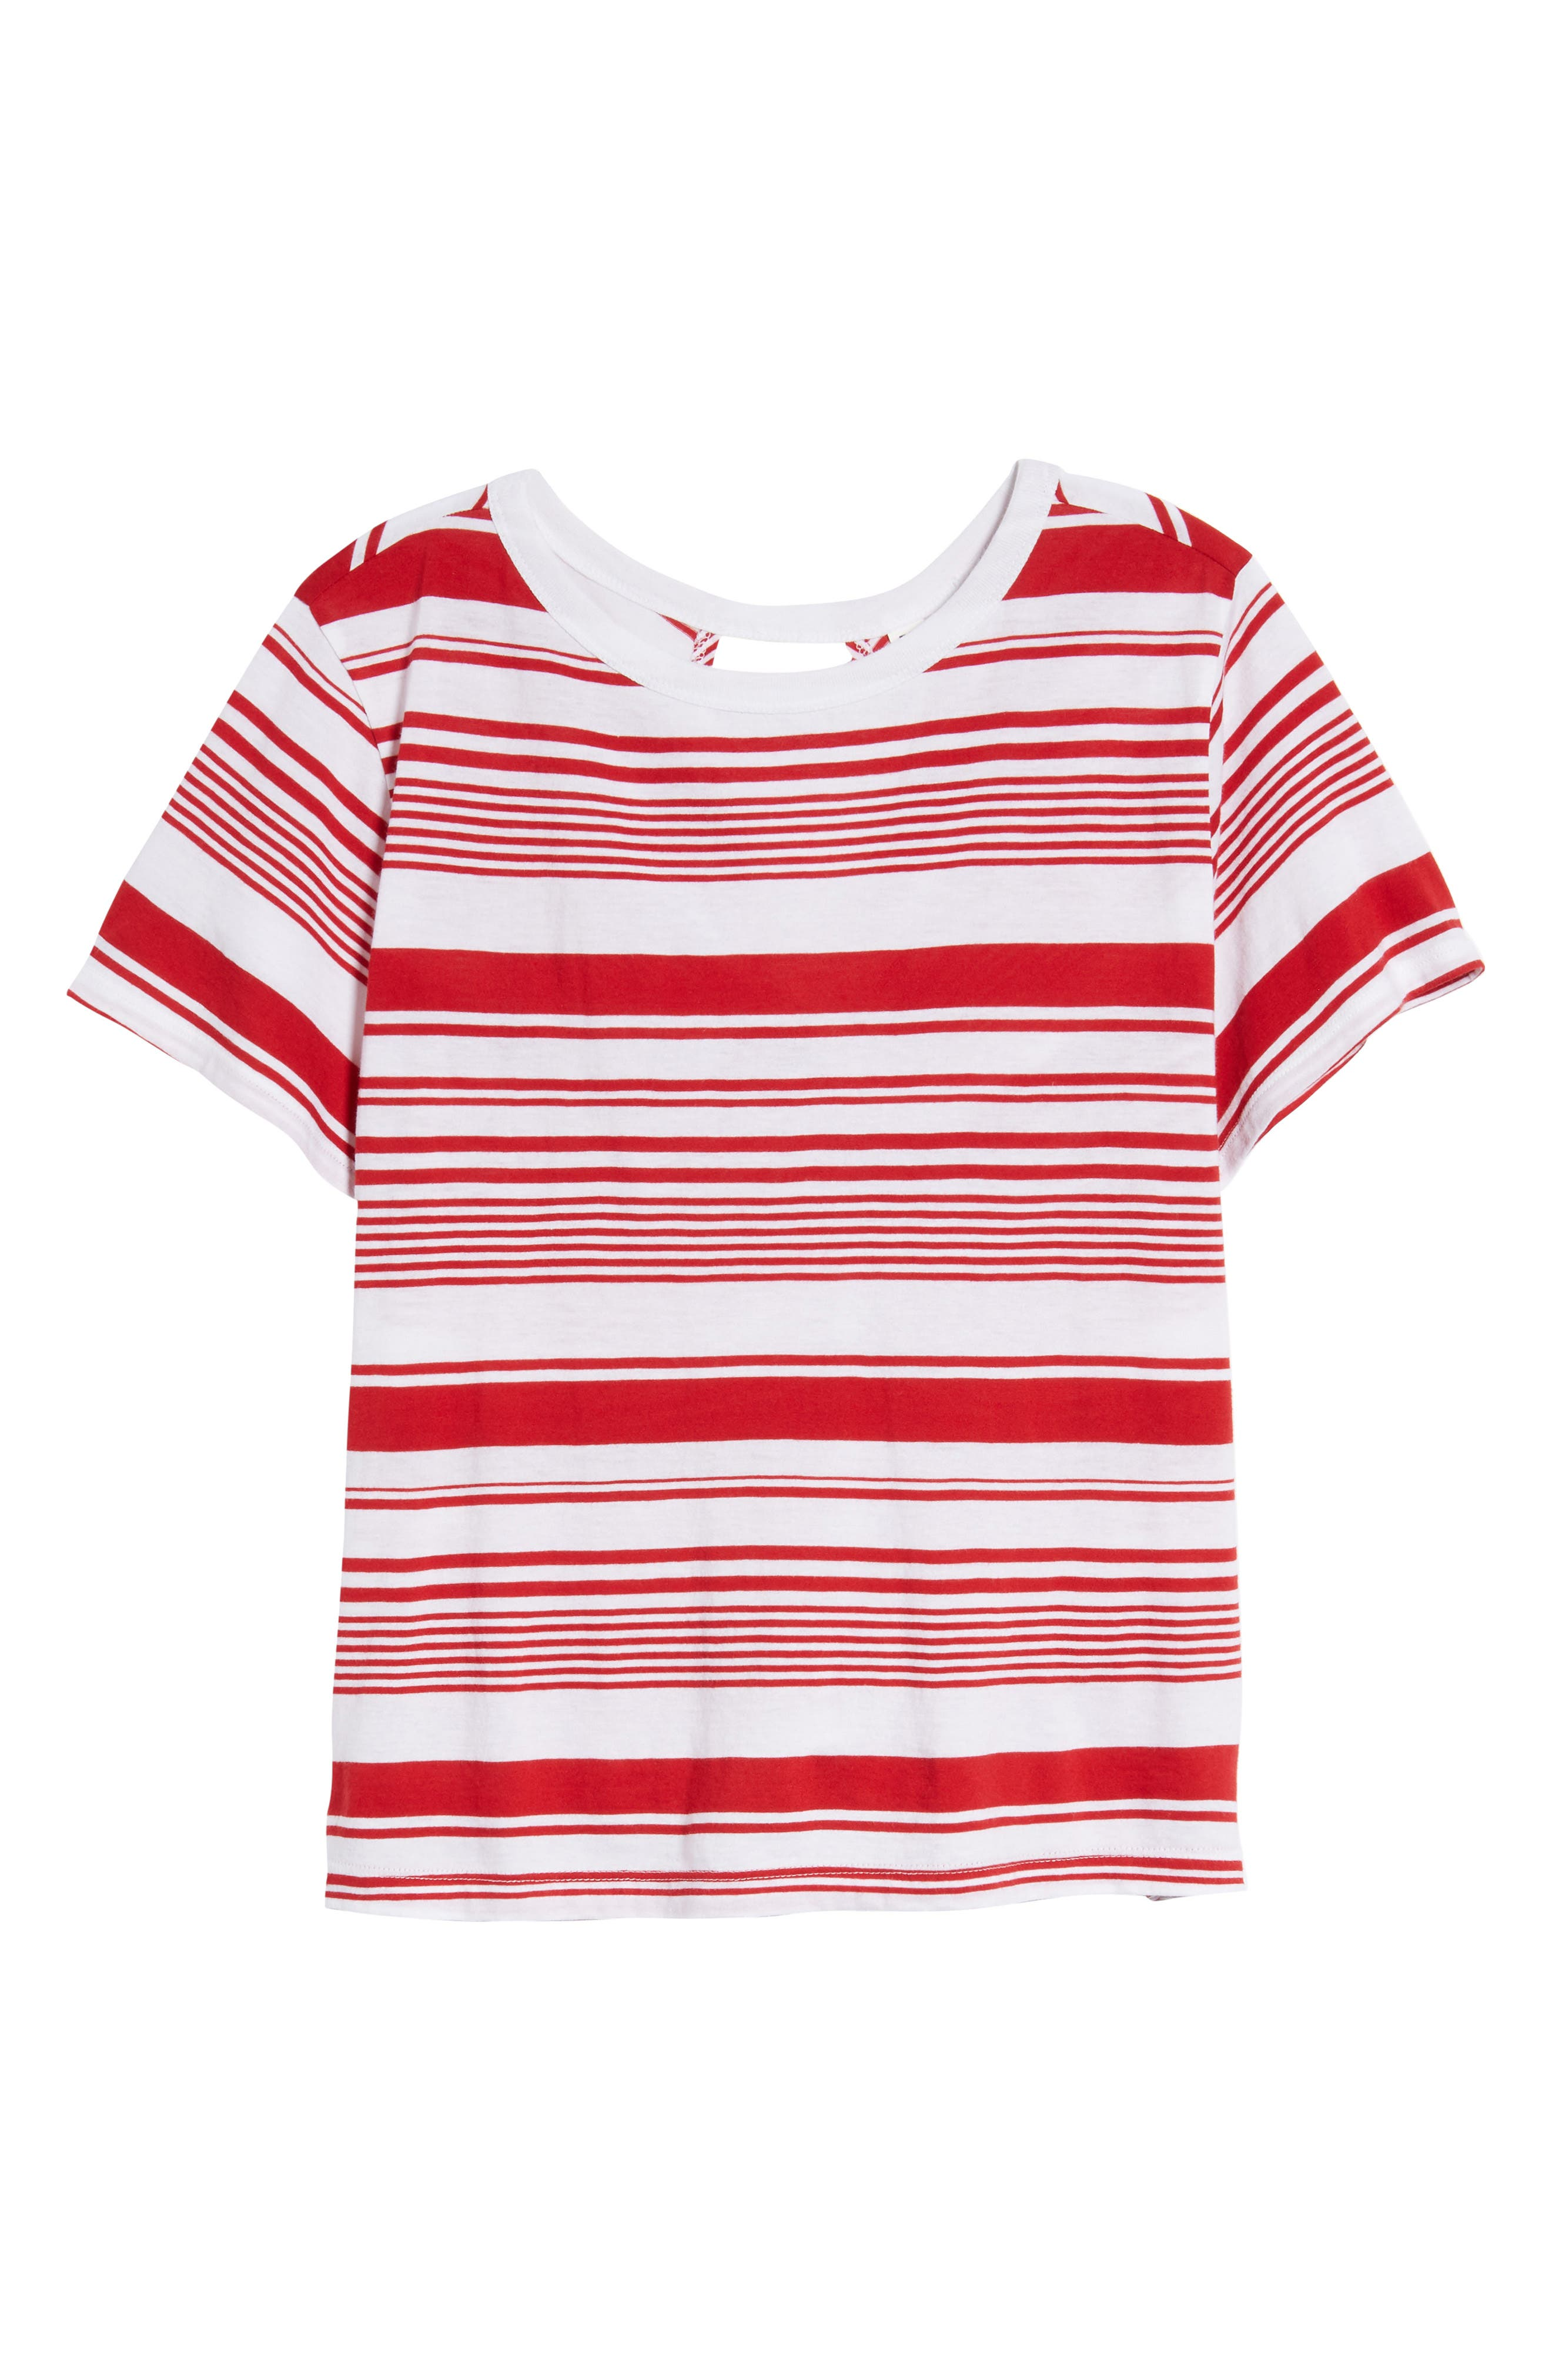 Twist Back Tee,                             Alternate thumbnail 7, color,                             Red Couture Monaco Stripe